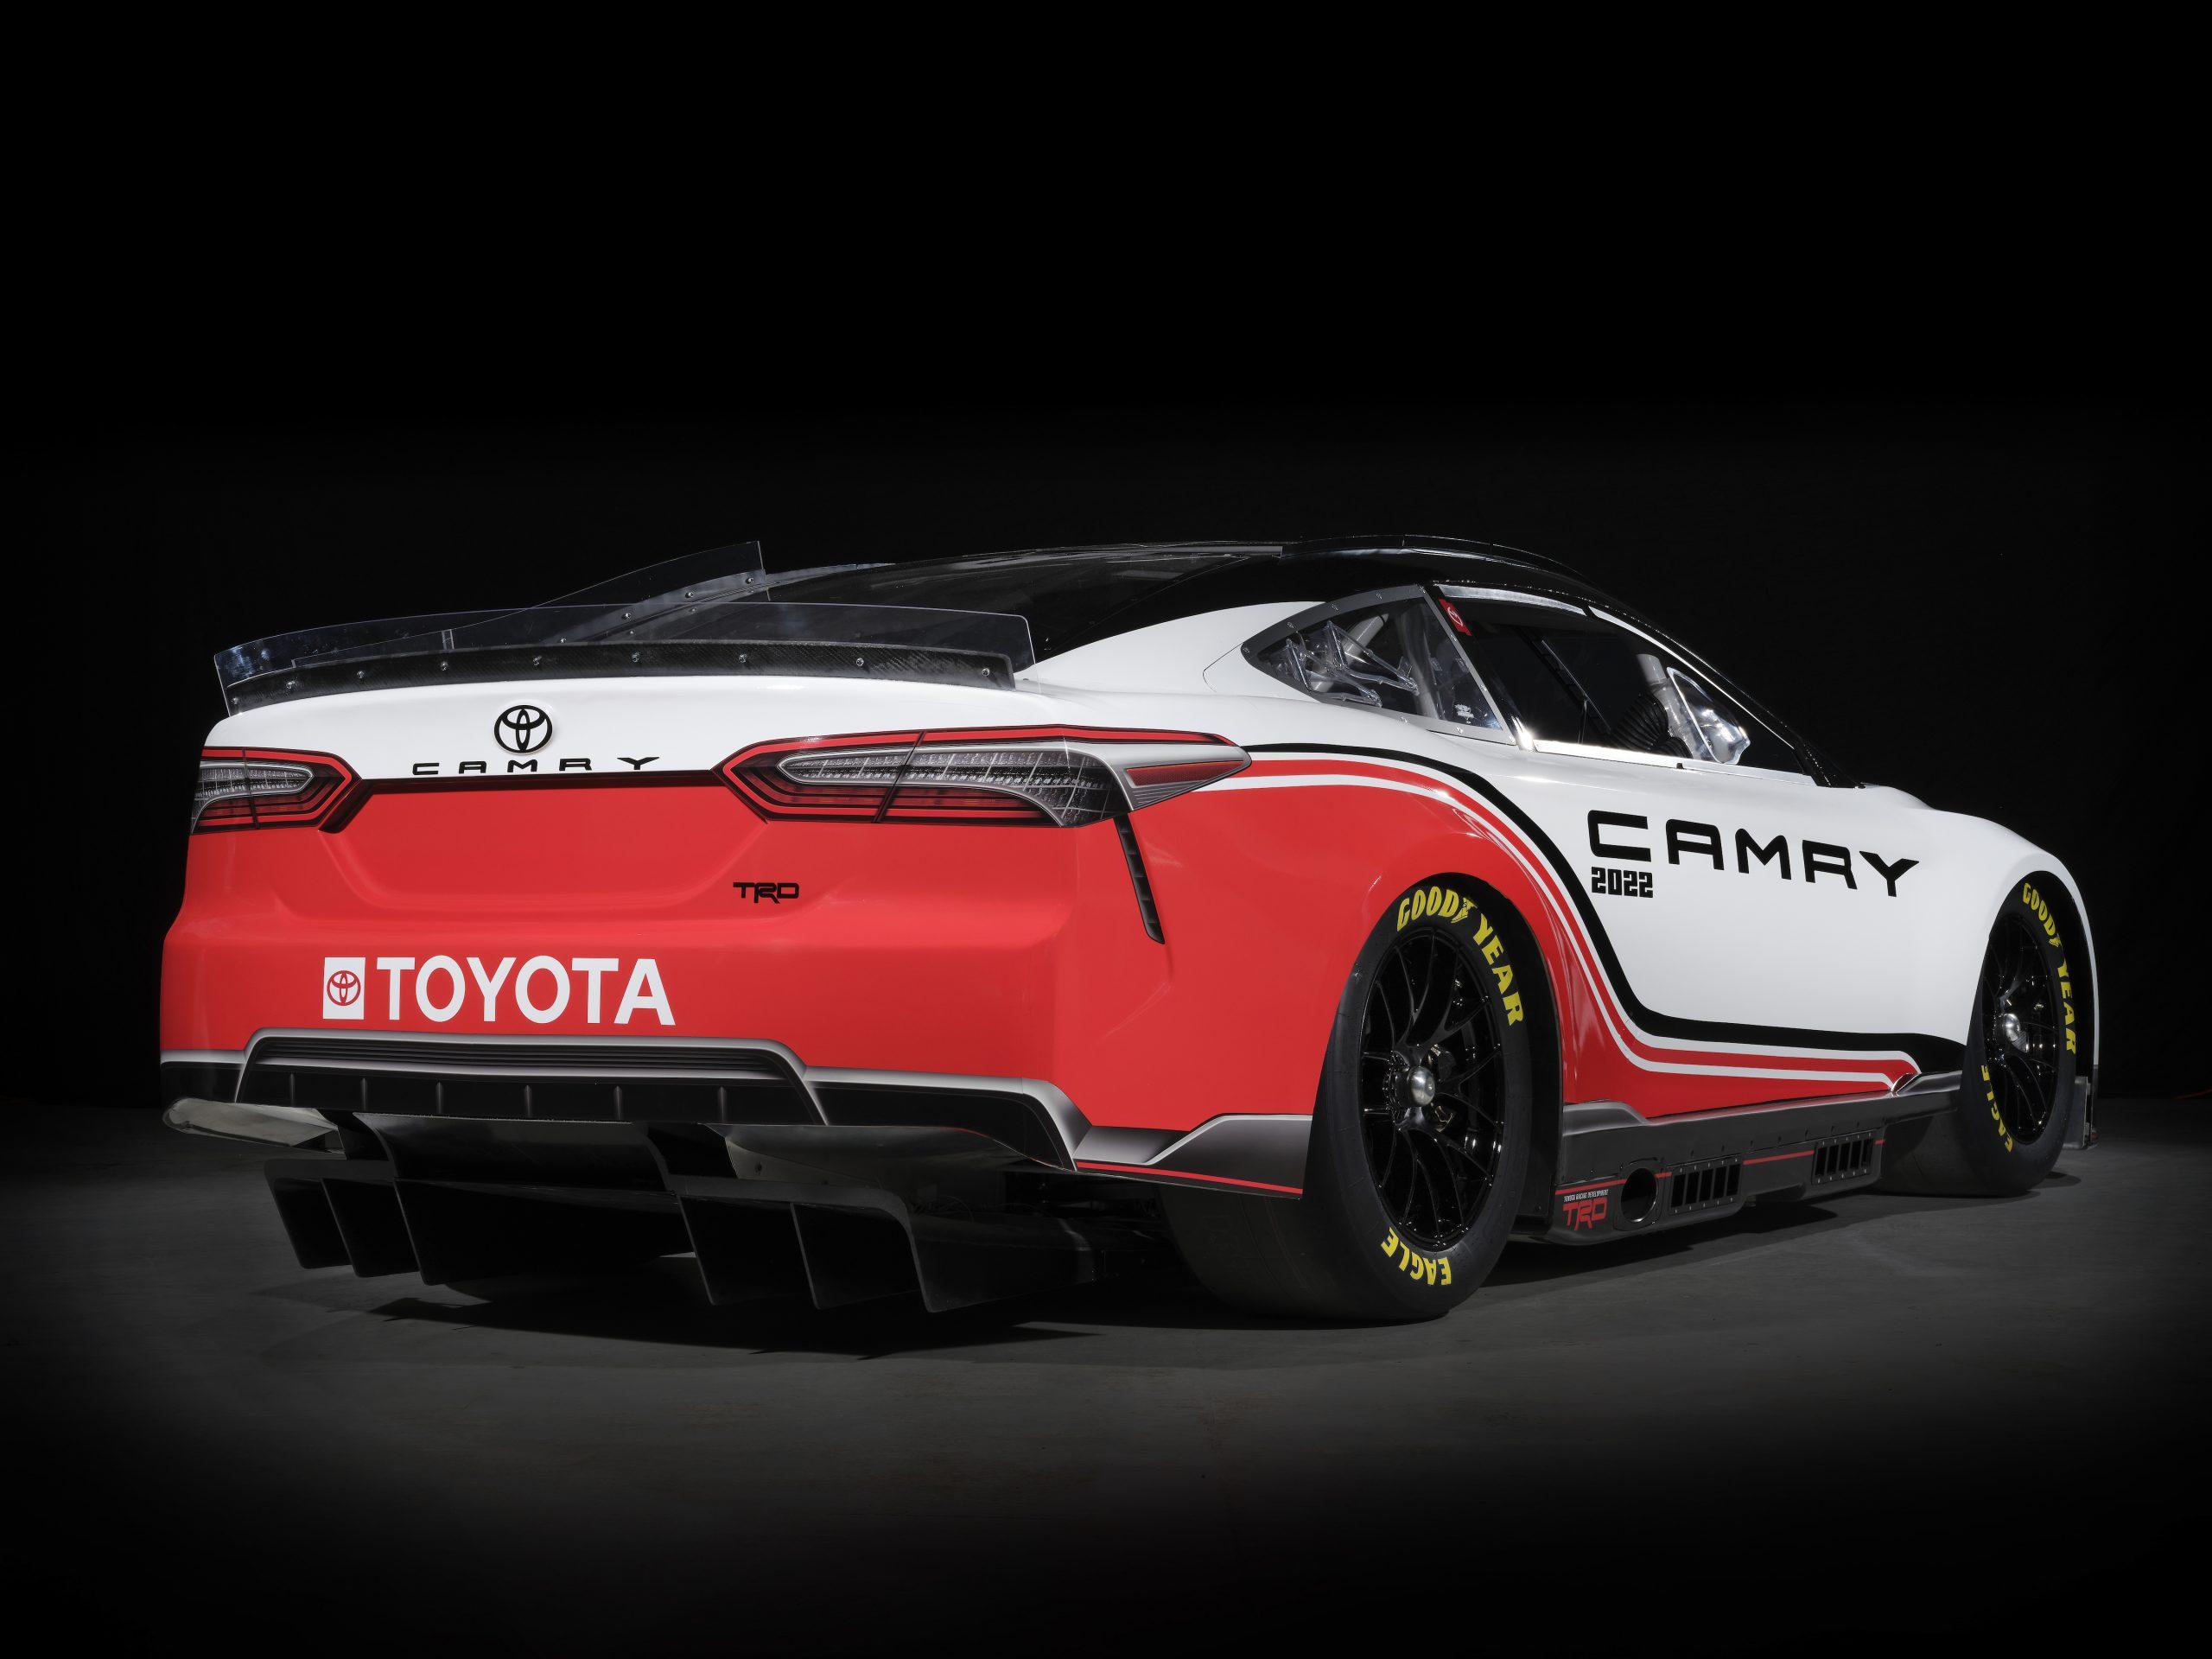 NASCAR Toyota Stock car camry rear studio